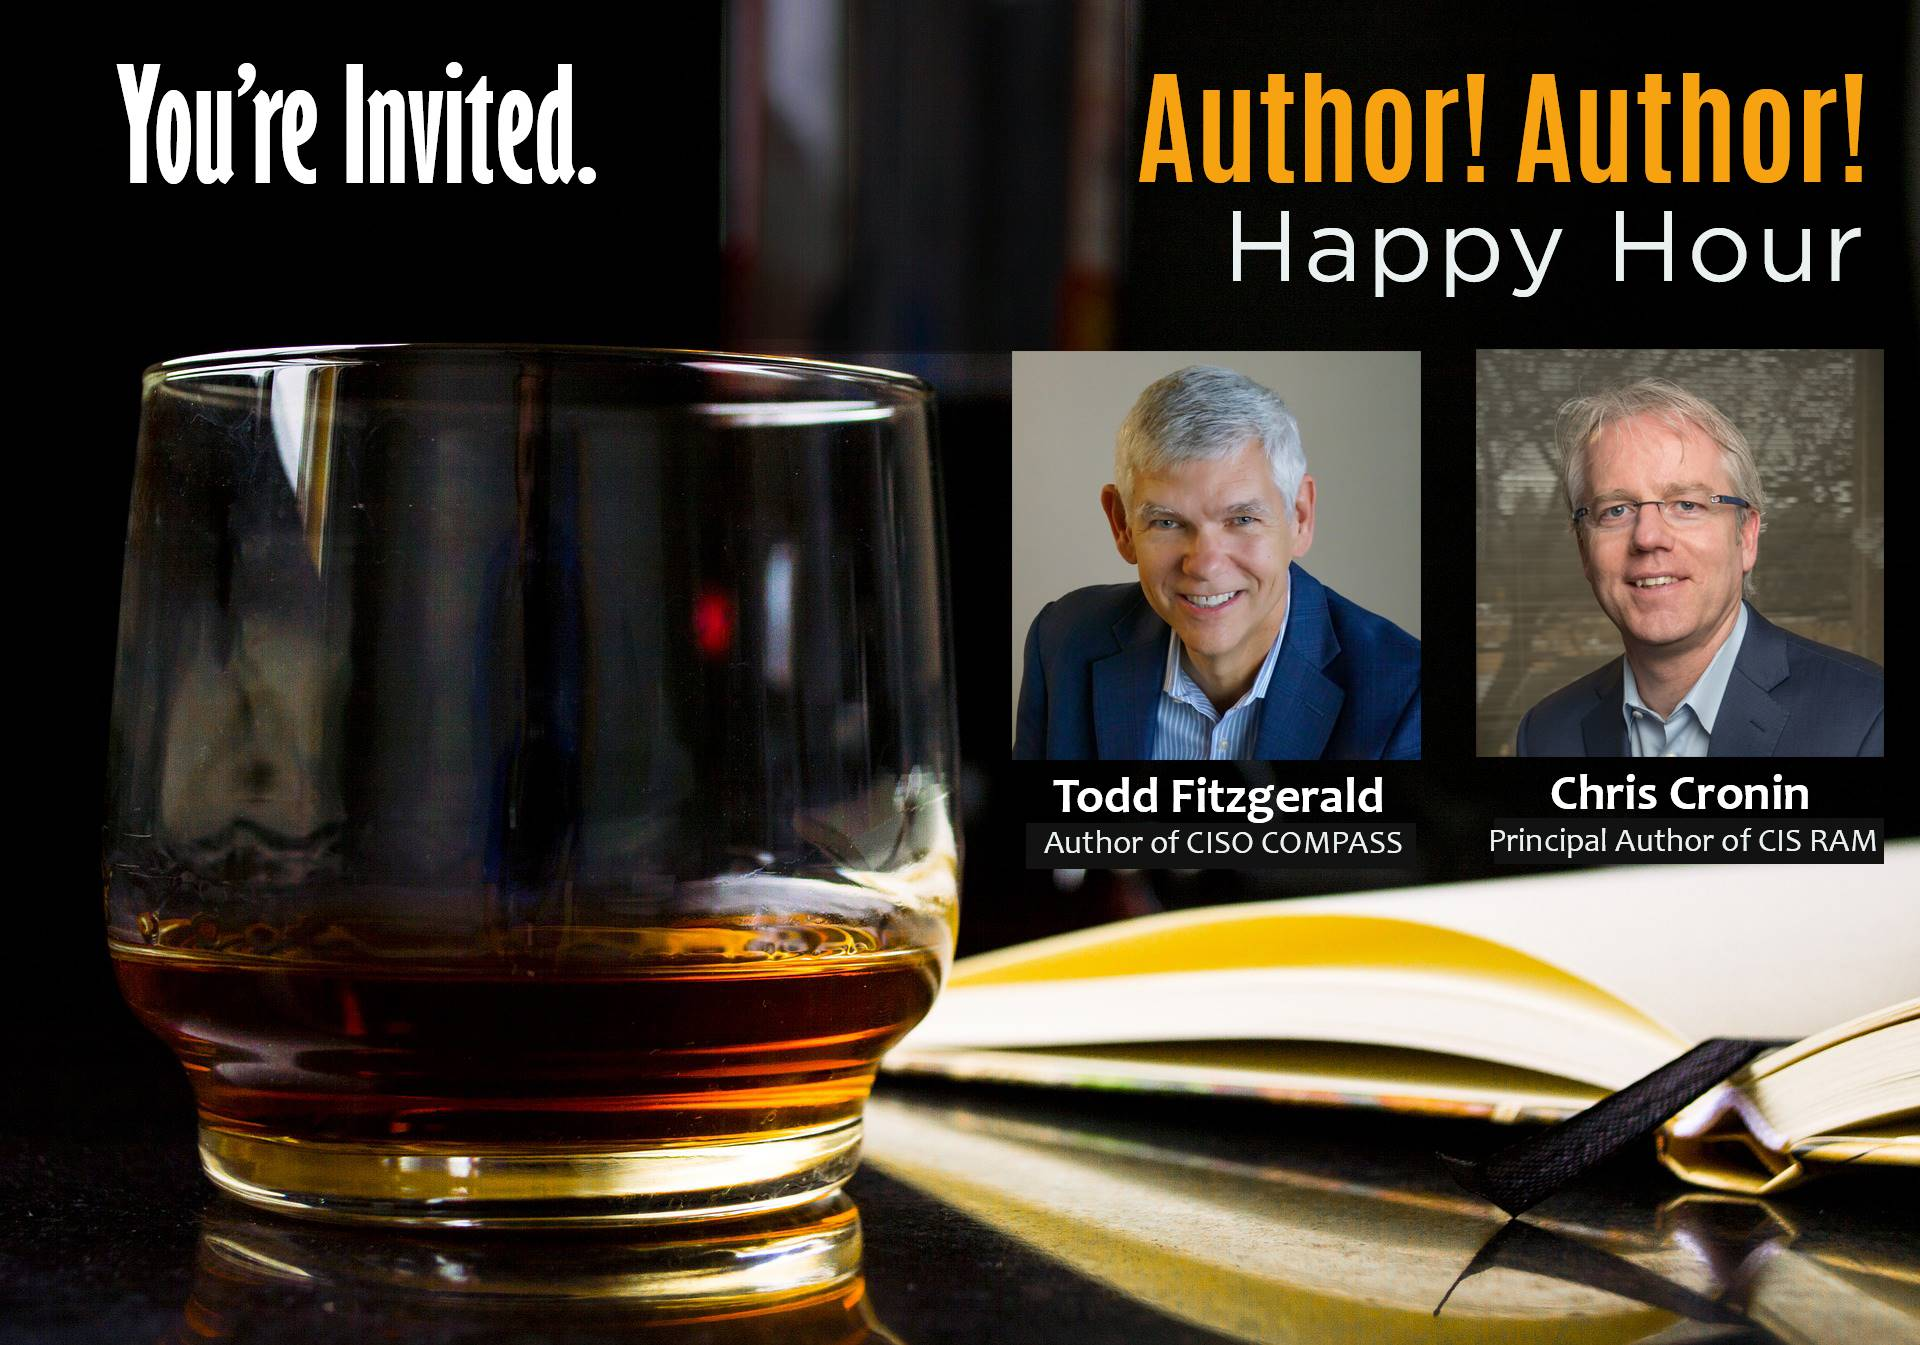 Author Author Happy Hour at RSA,